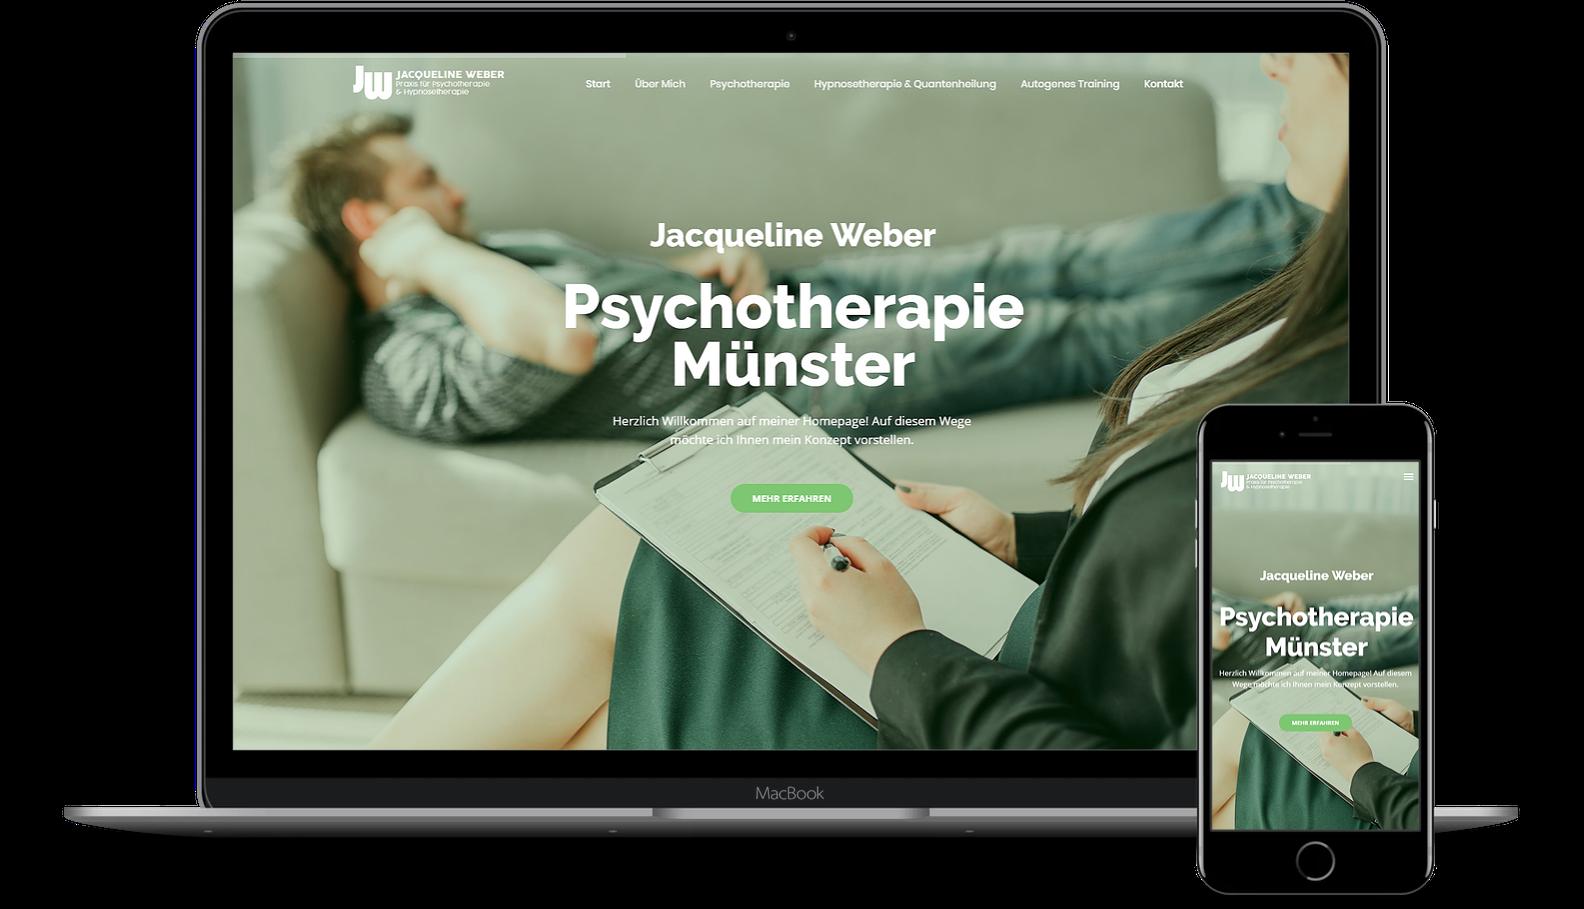 Jacqueline Weber - Webdesign by Komomedia